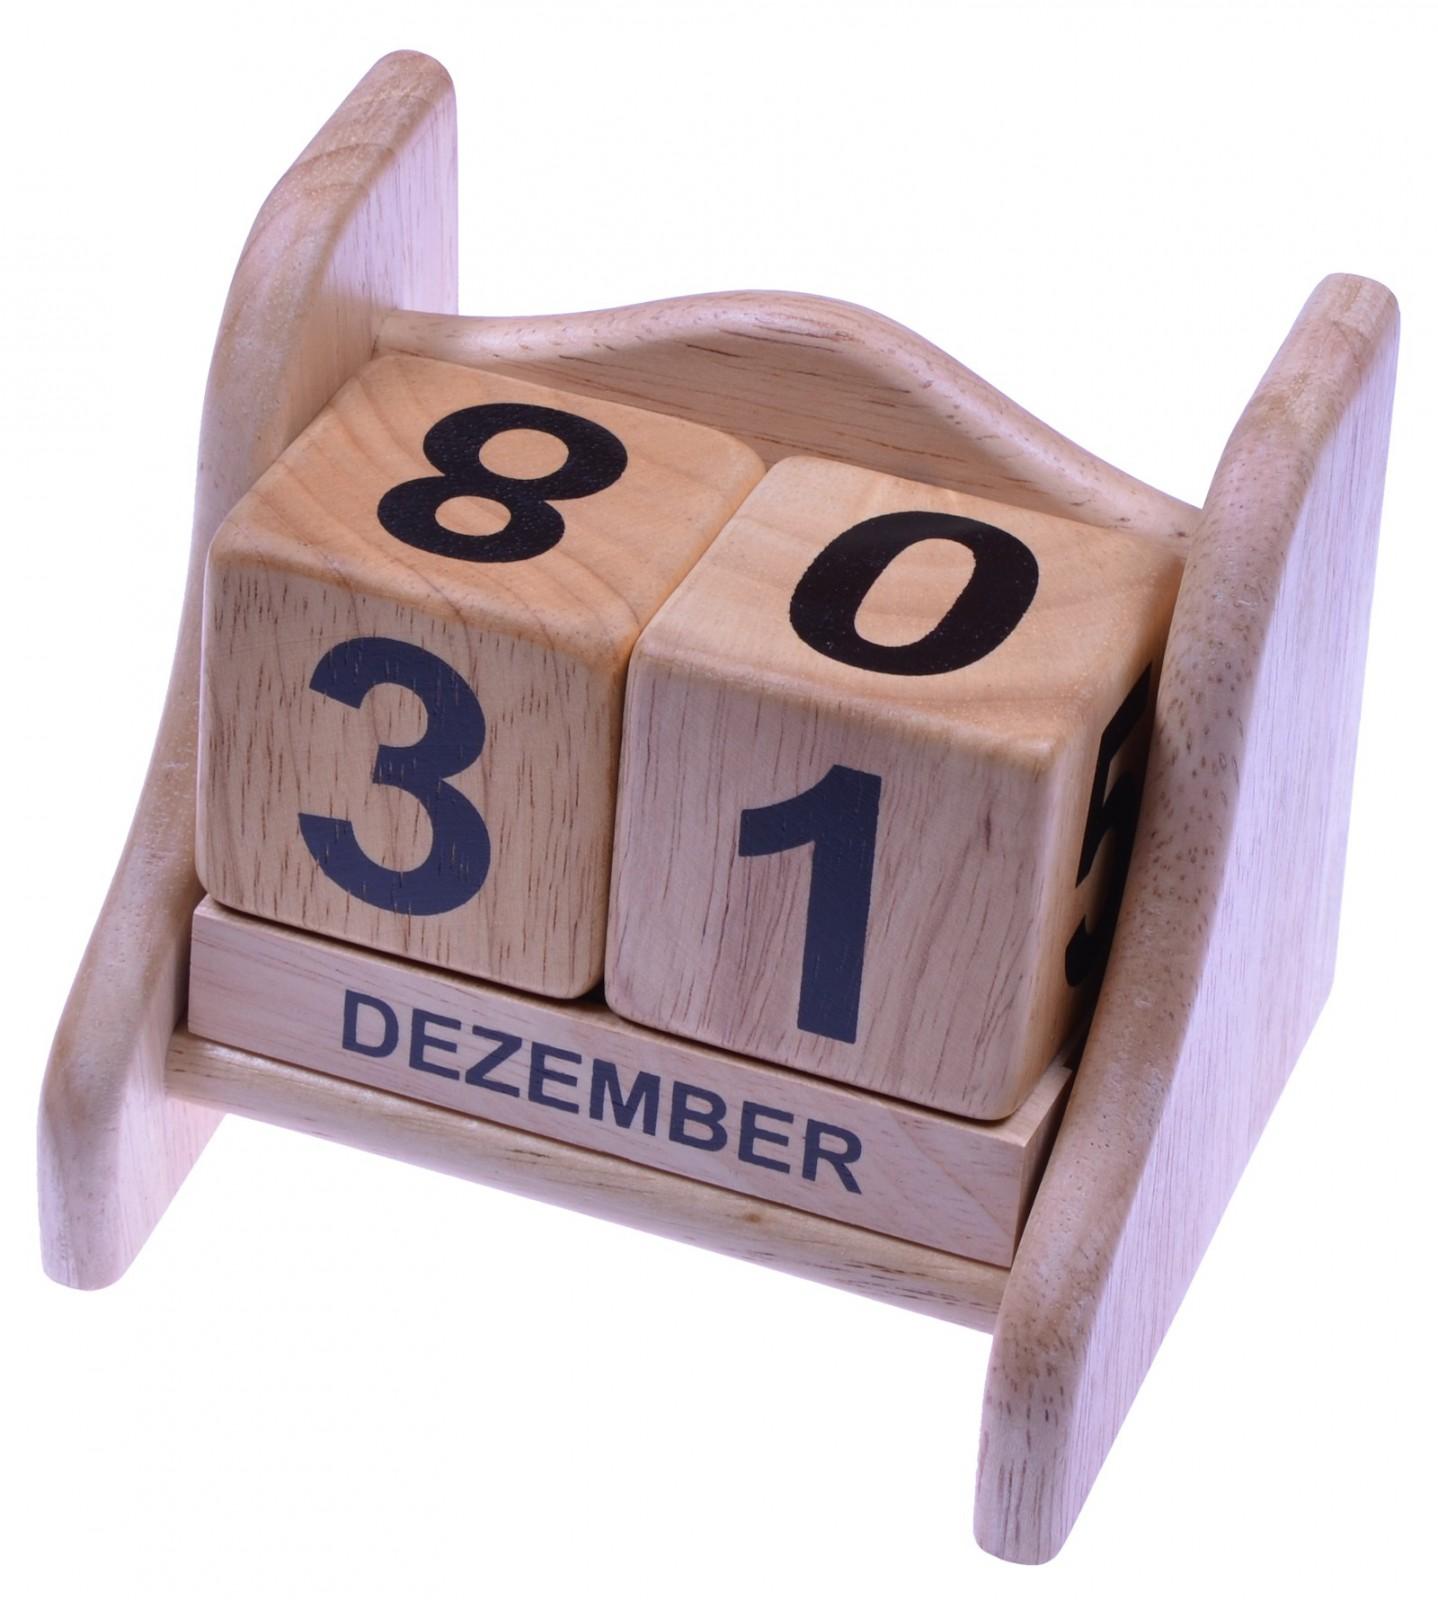 ewiger kalender dauerkalender datumsanzeige aus holz. Black Bedroom Furniture Sets. Home Design Ideas